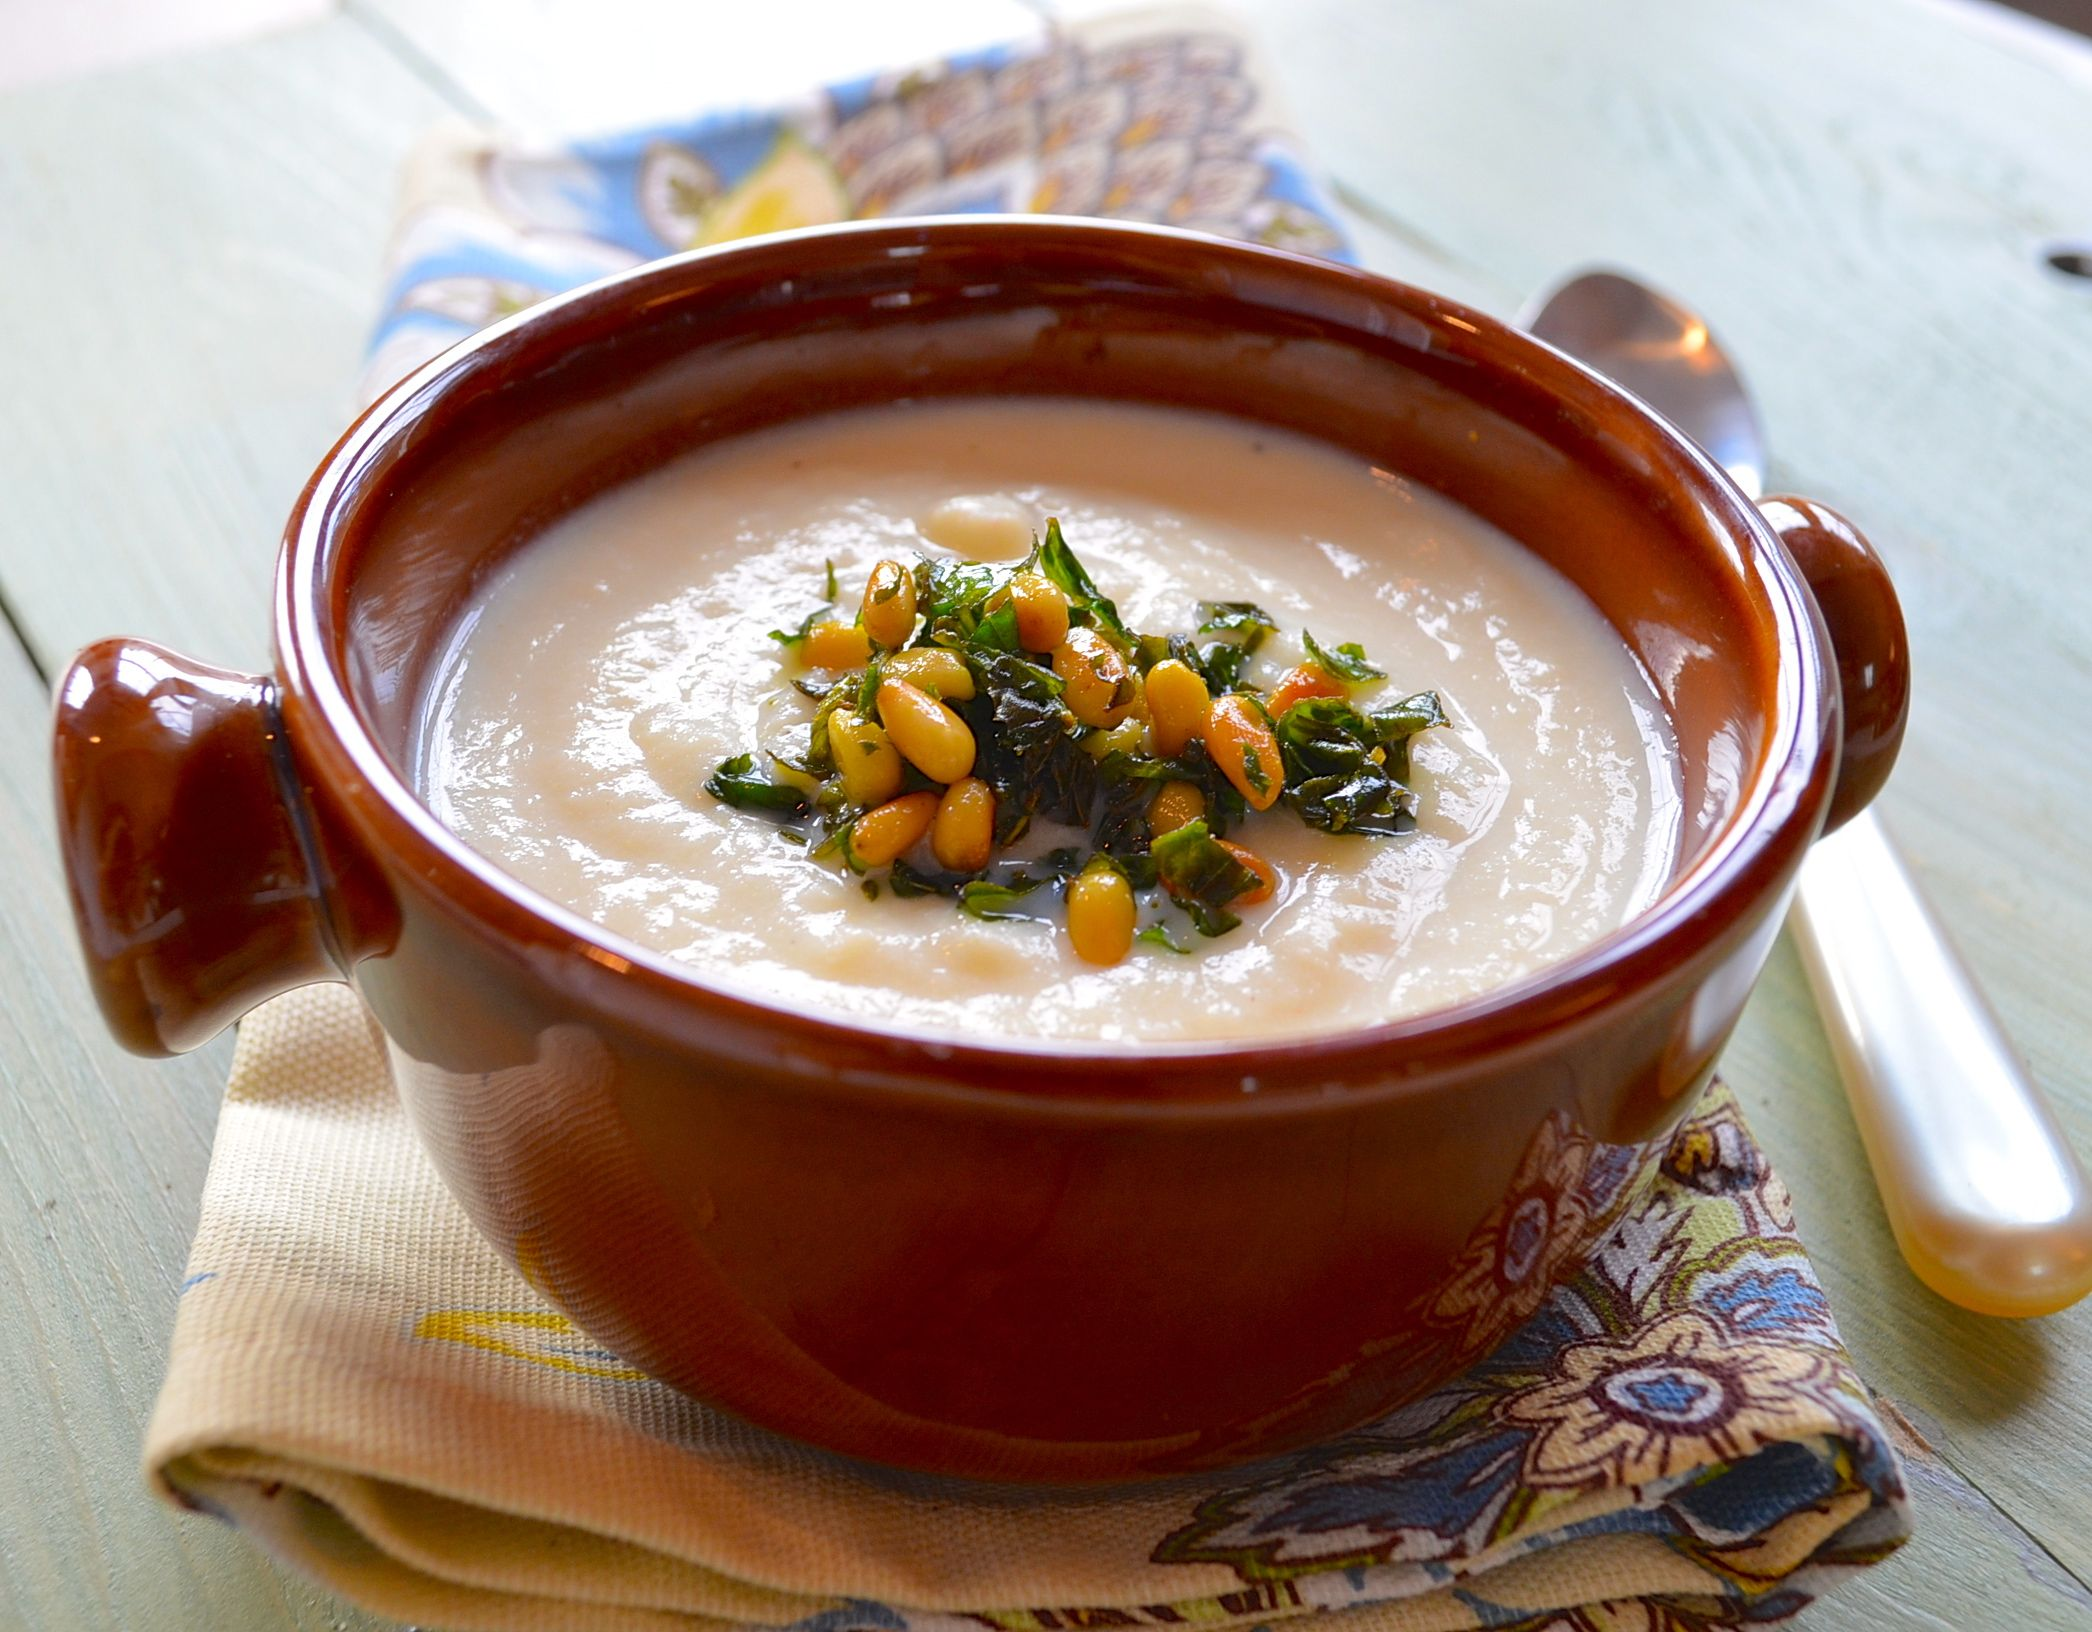 Creamy Corn Soup.  It looks mouthwatering~~